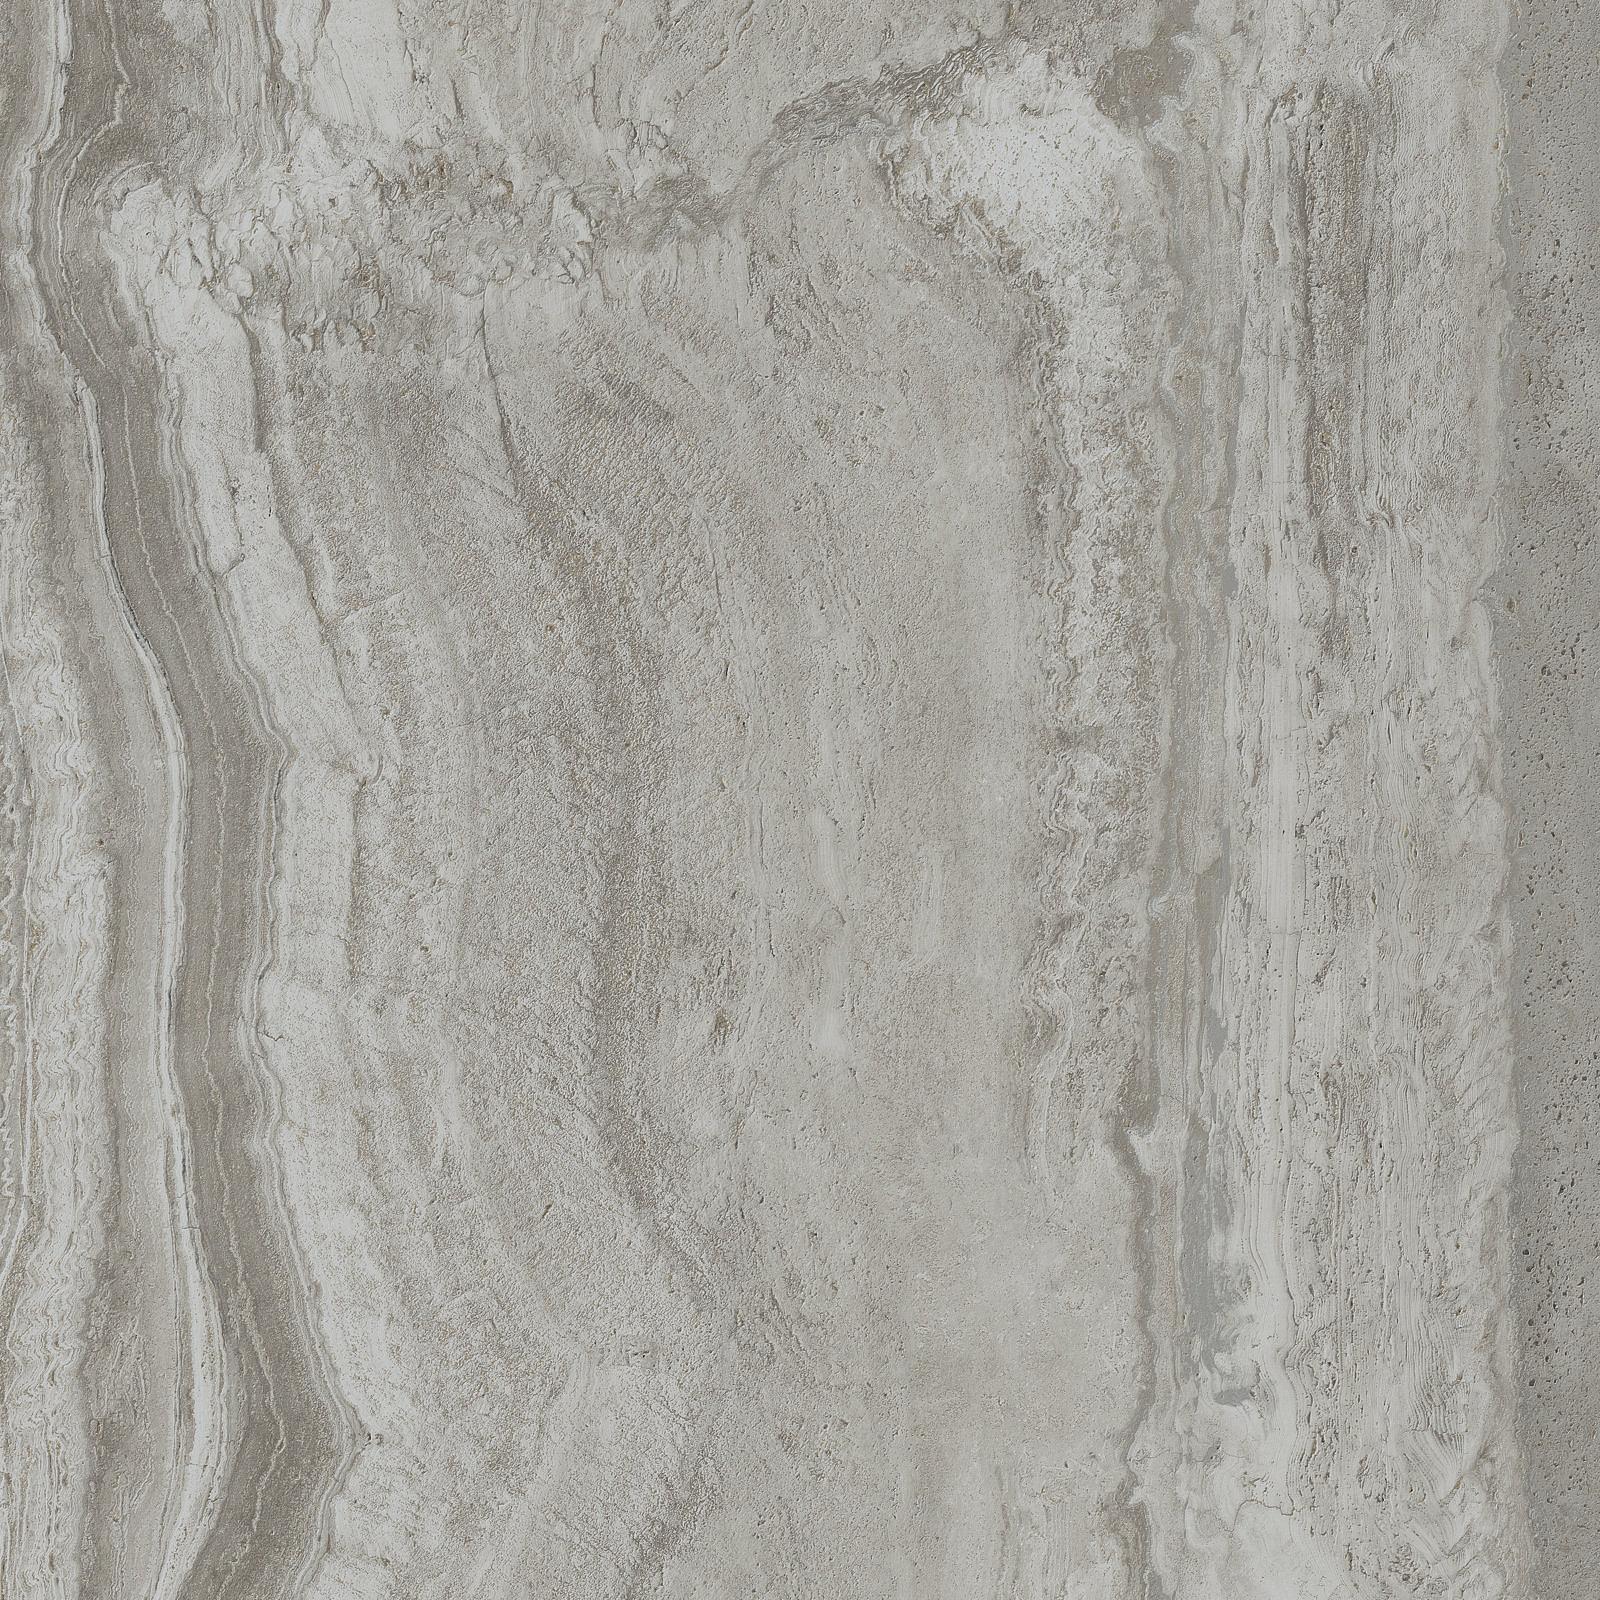 Background tile Navona by Flaviker, Unglazed porcelain stoneware, 80x80 cm, Surface Finish antislip, Effect stone, Color grey,